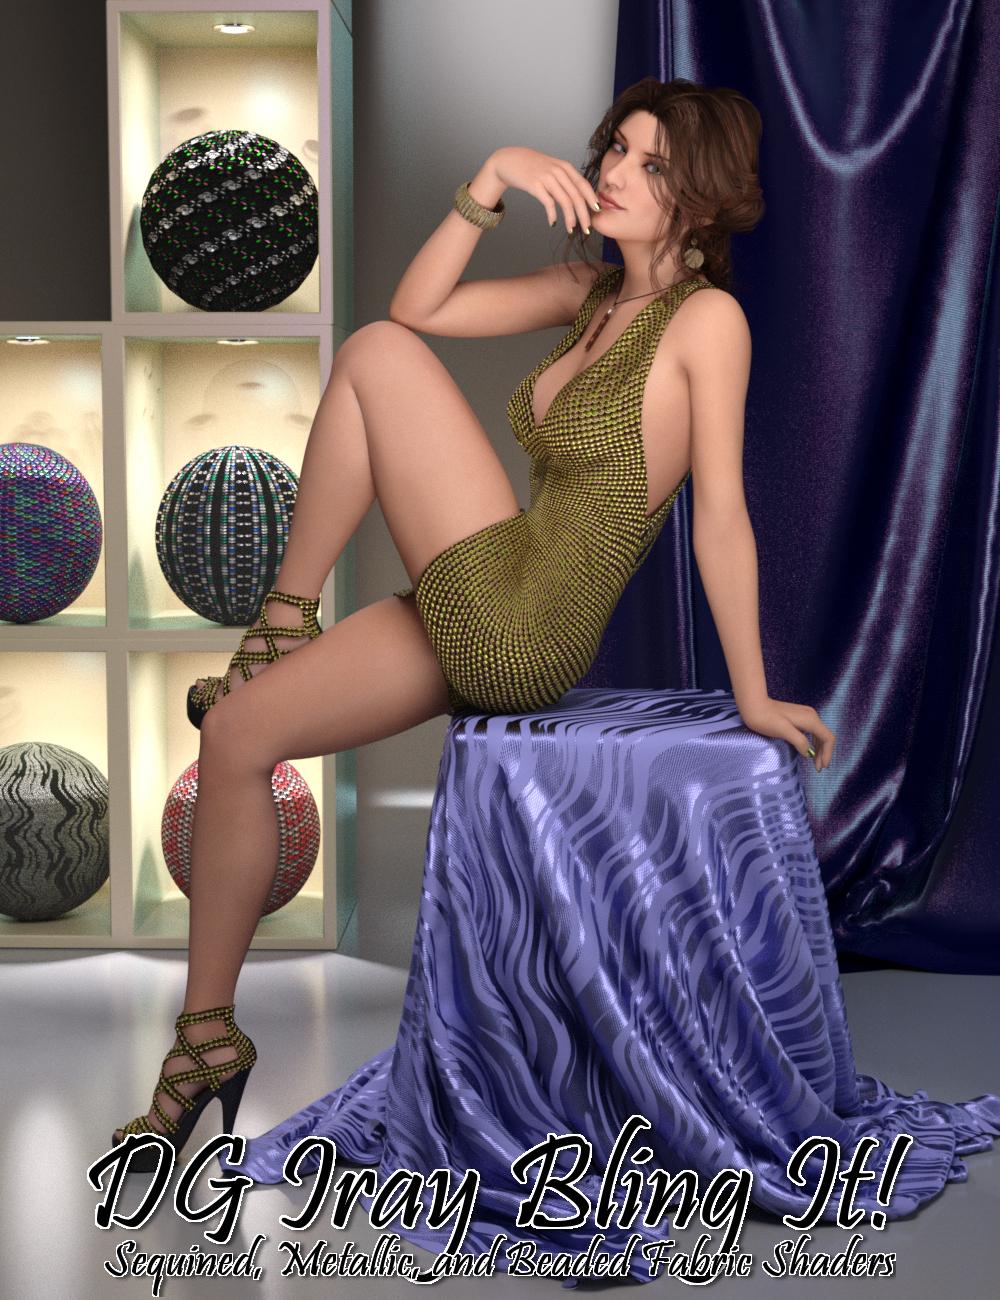 DG Iray Bling It! Shaders by: IDG DesignsDestinysGarden, 3D Models by Daz 3D